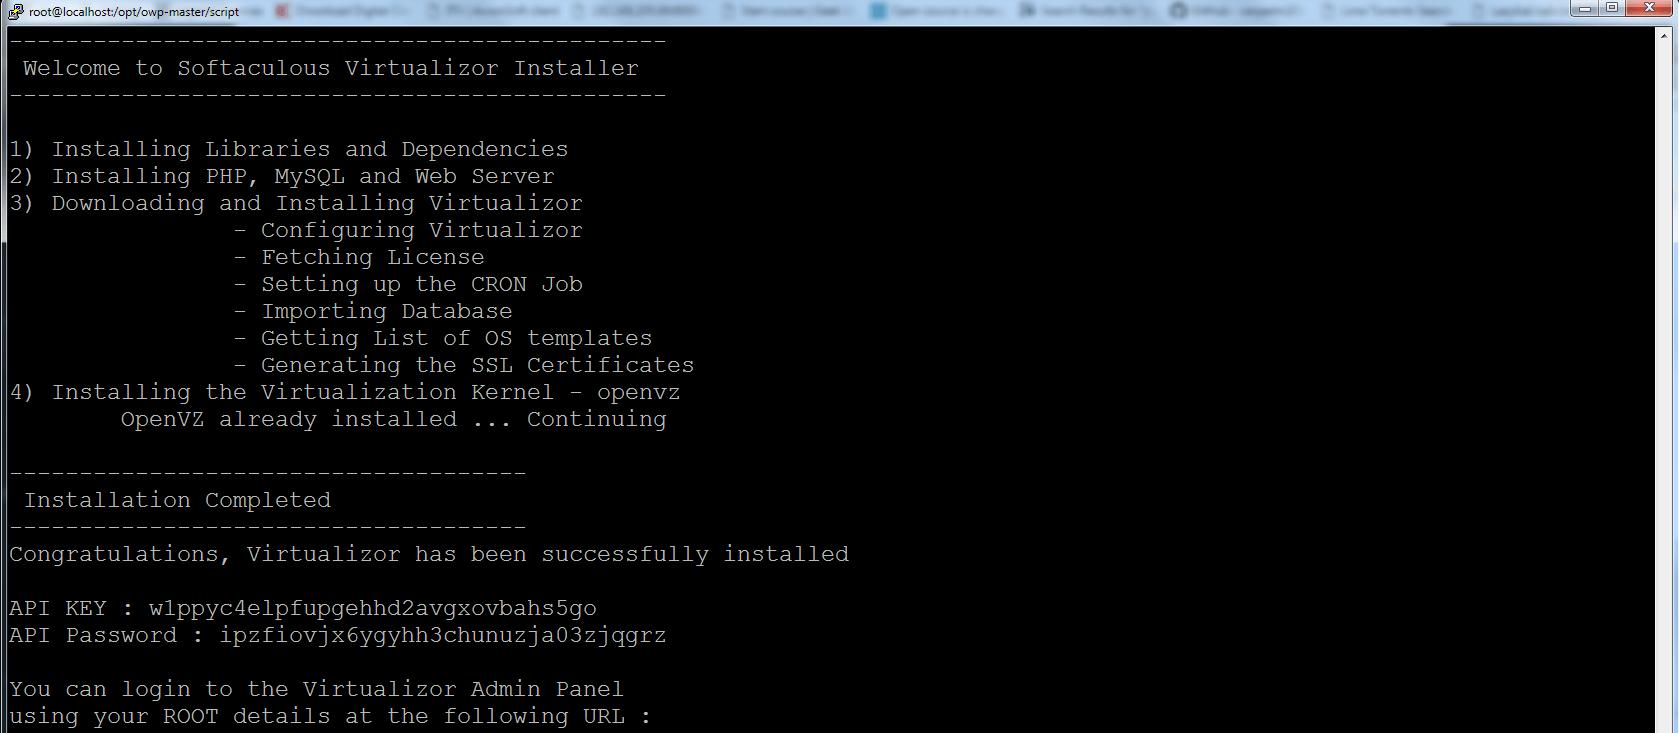 loginvirtualizor